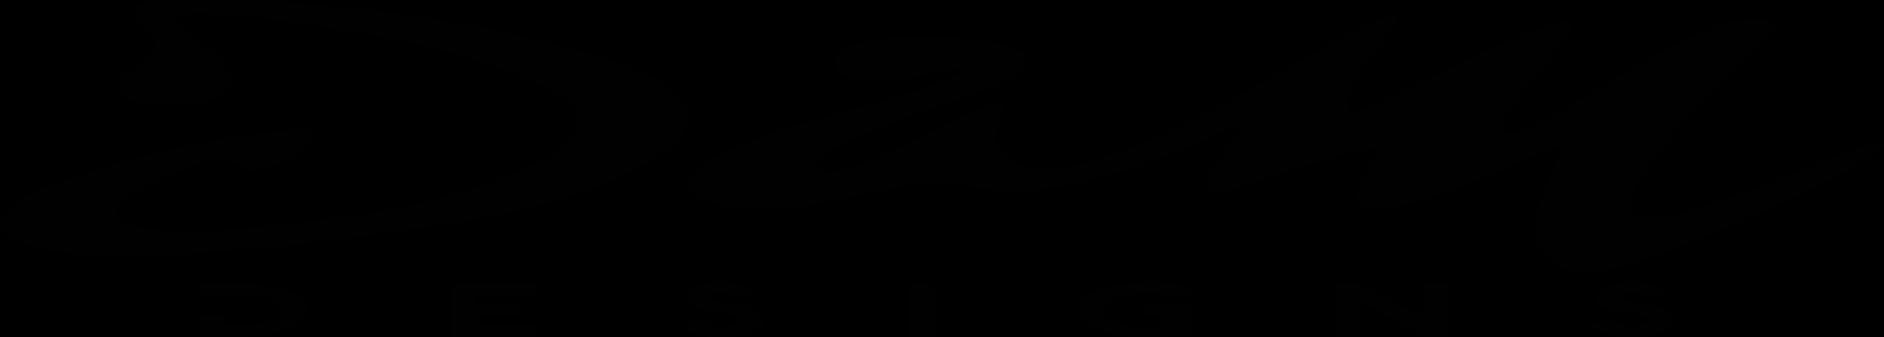 Logo DAM Designs Zwart